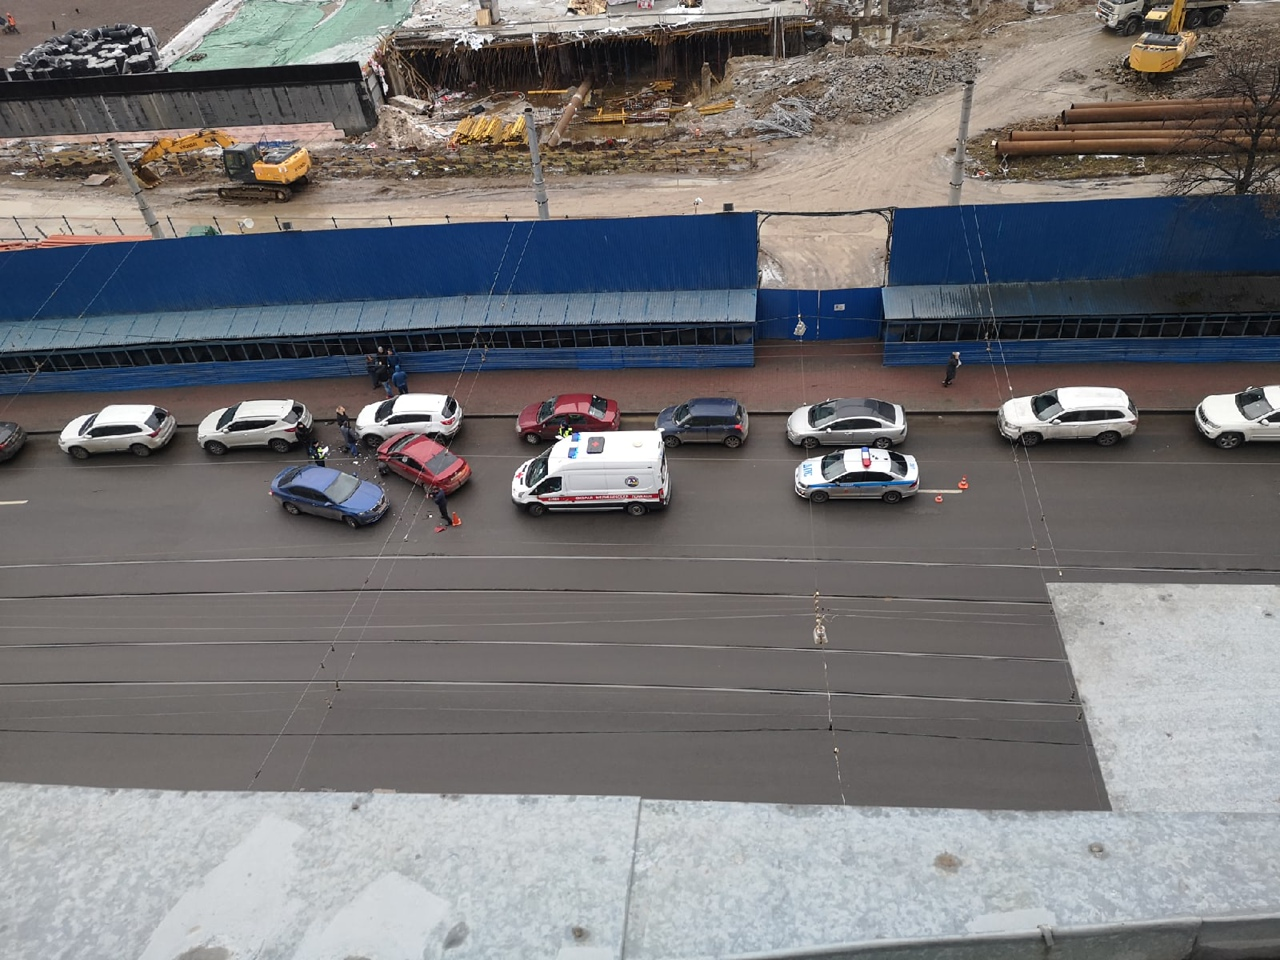 Skoda и Hyundai столкнулись на Добролюбова. Пострадала мирно стоящая Kia. Скорая, дпс на месте